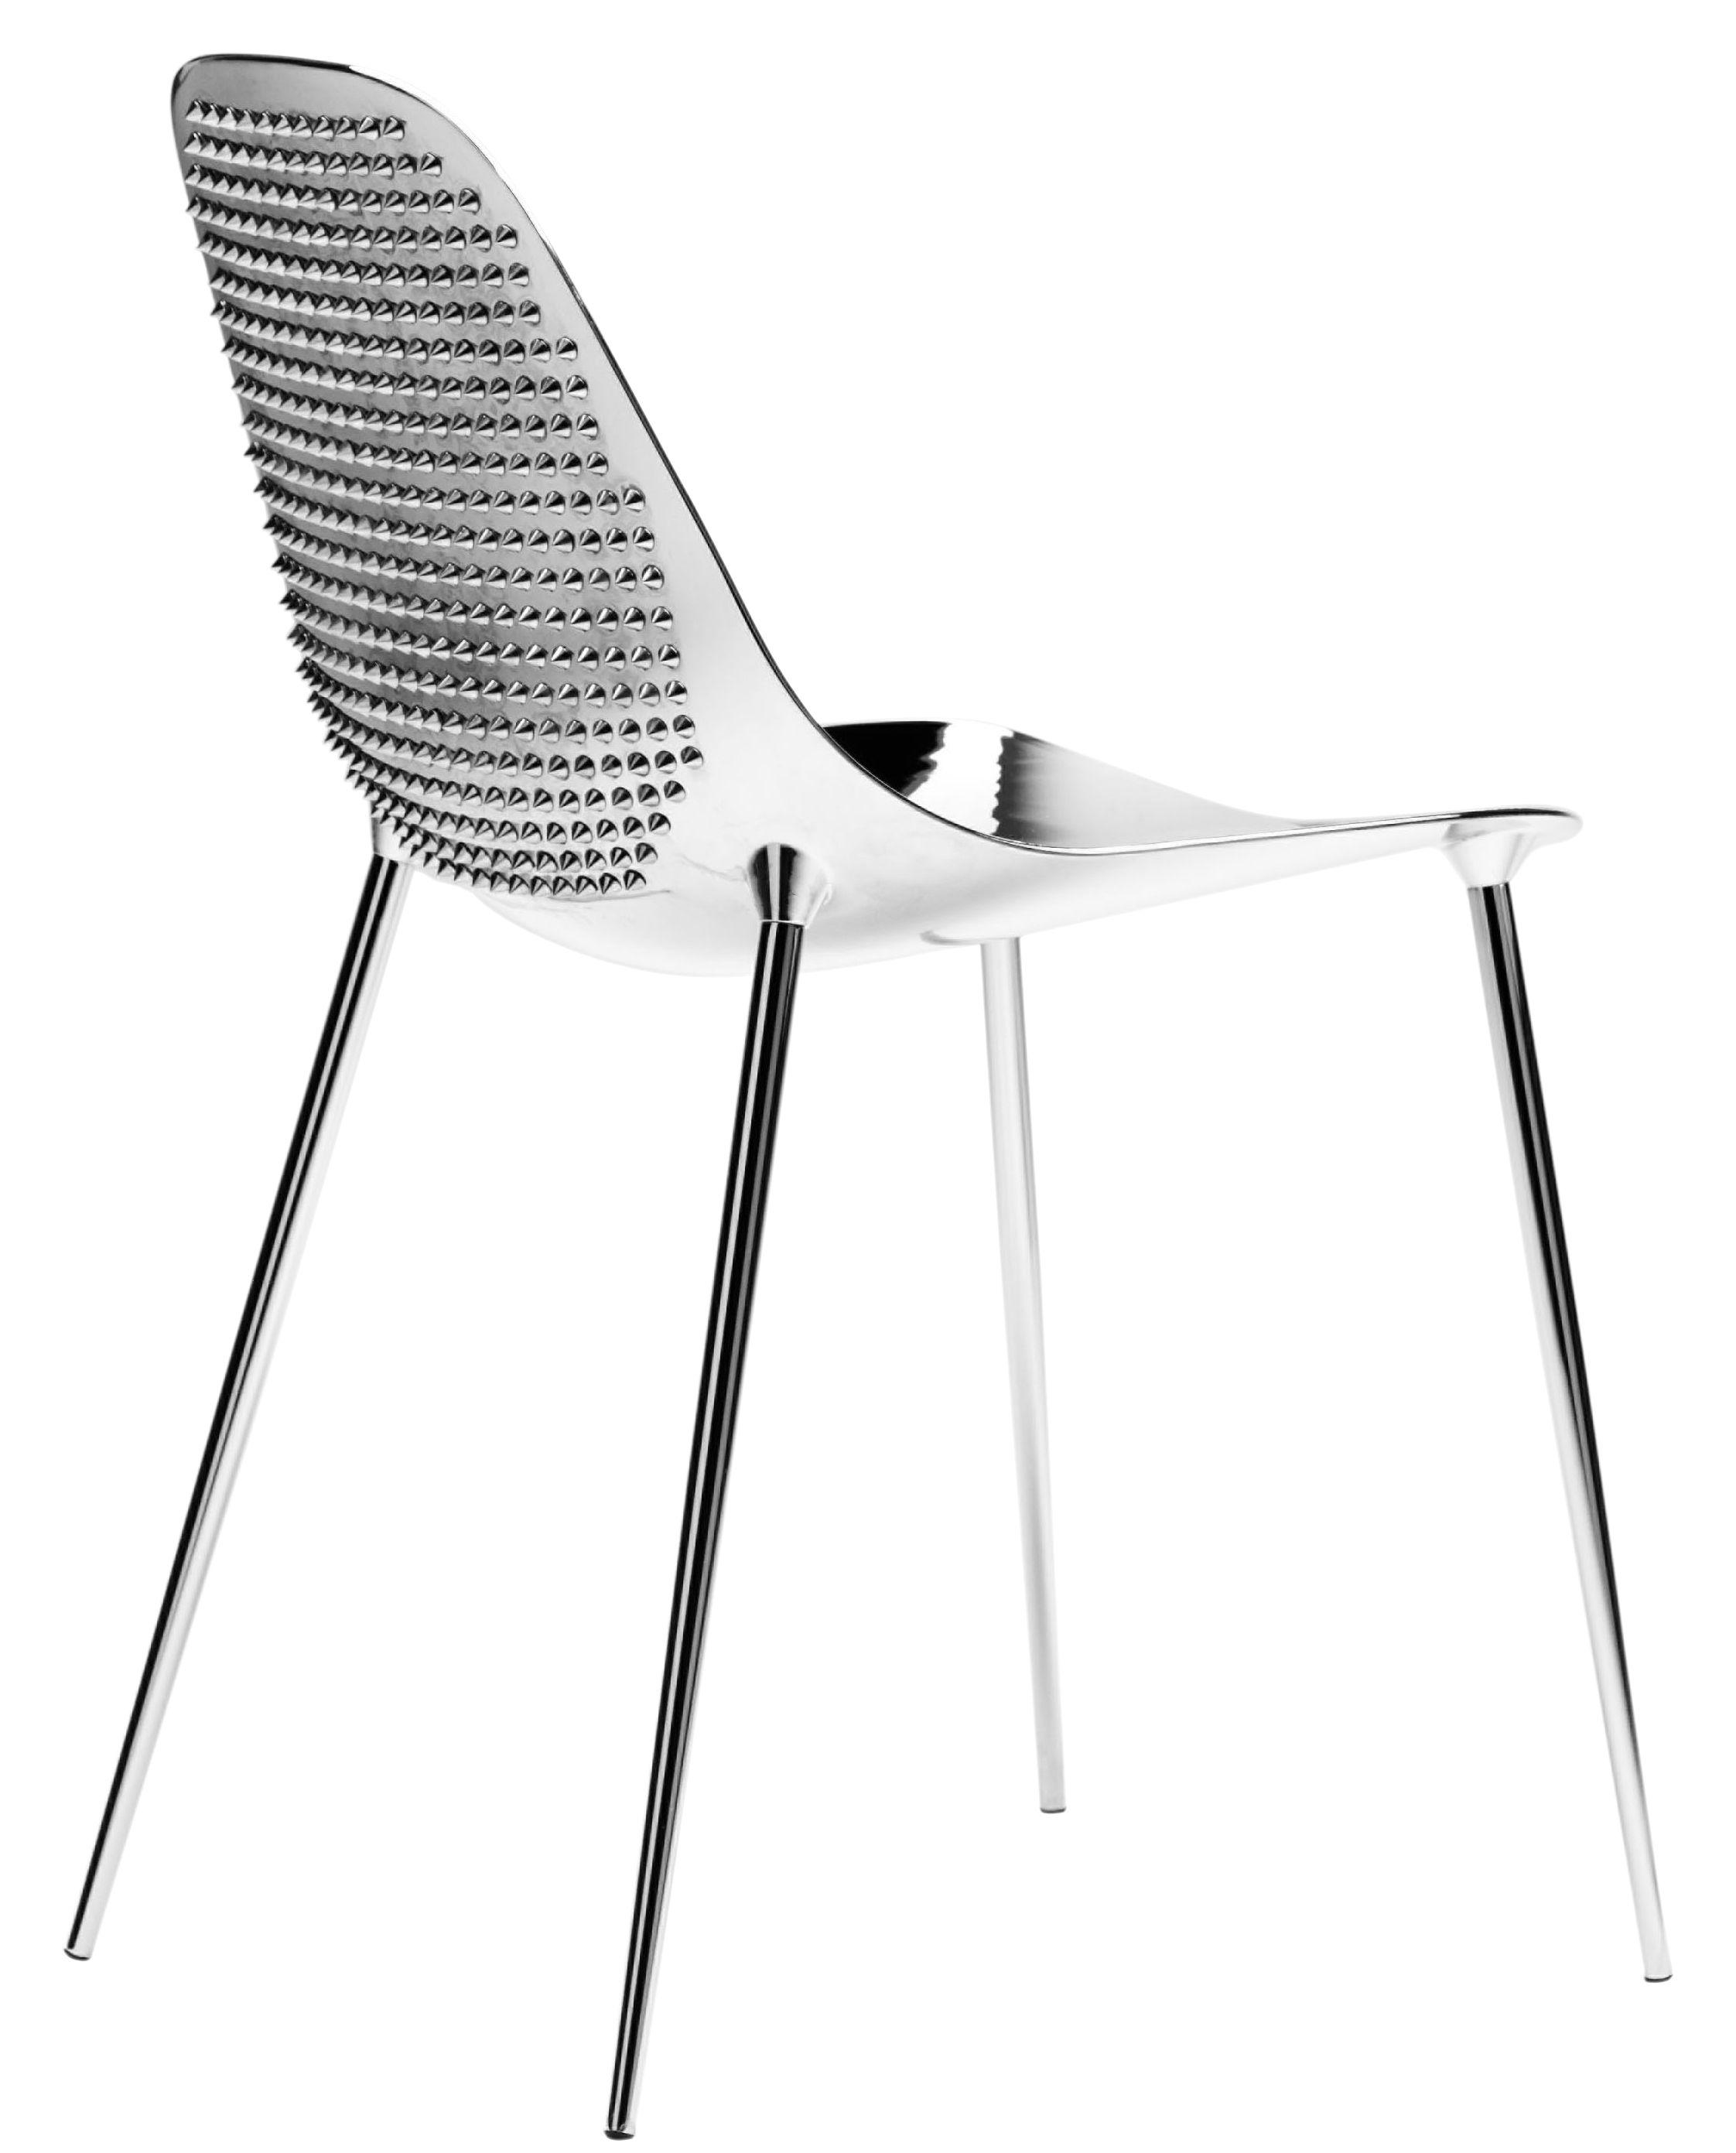 Furniture - Chairs - Mammamia Punk Chair - Hobnailed / Metal shell & legs by Opinion Ciatti - Chromed - Aluminium, Metal